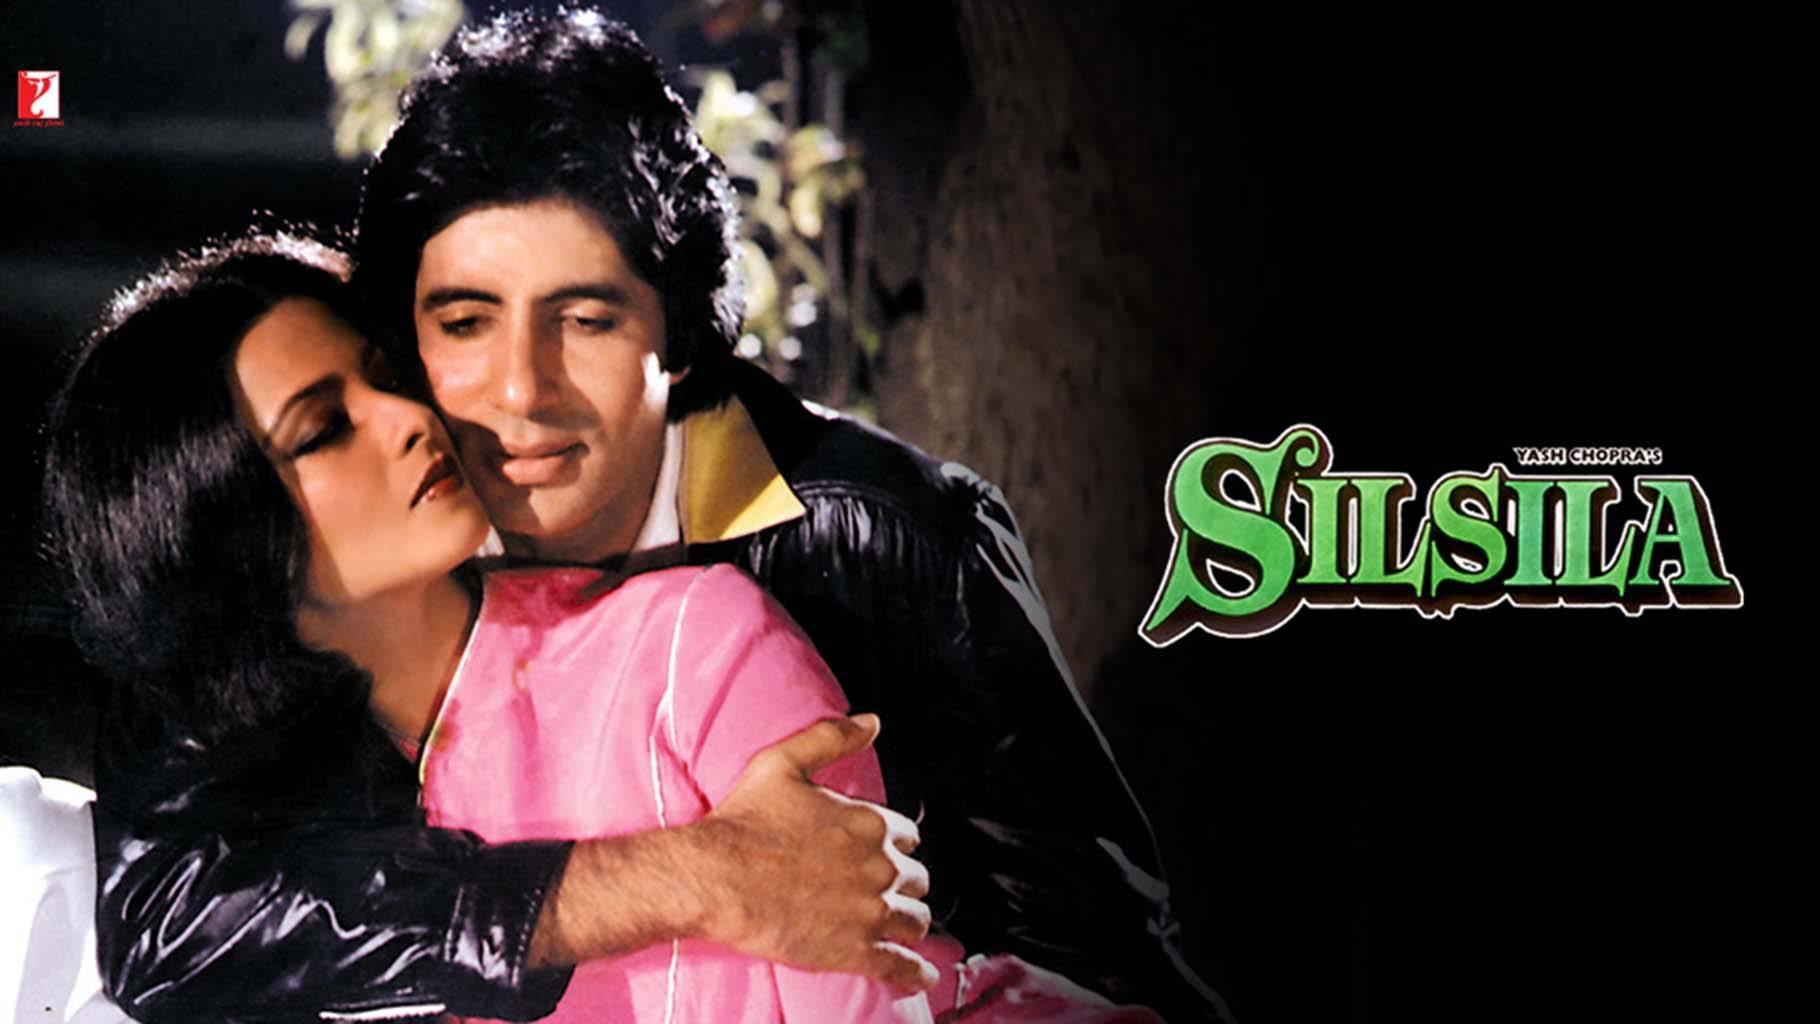 Image result for silsila movie